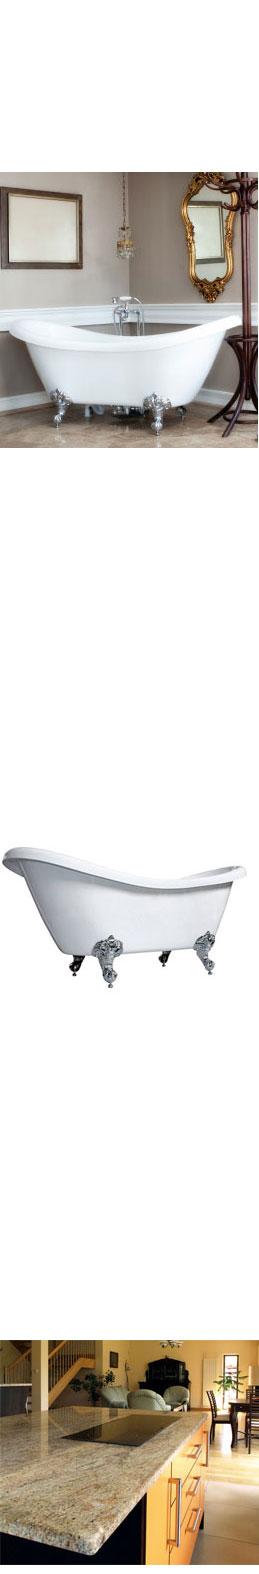 Porcelite Bathtub Refinishing